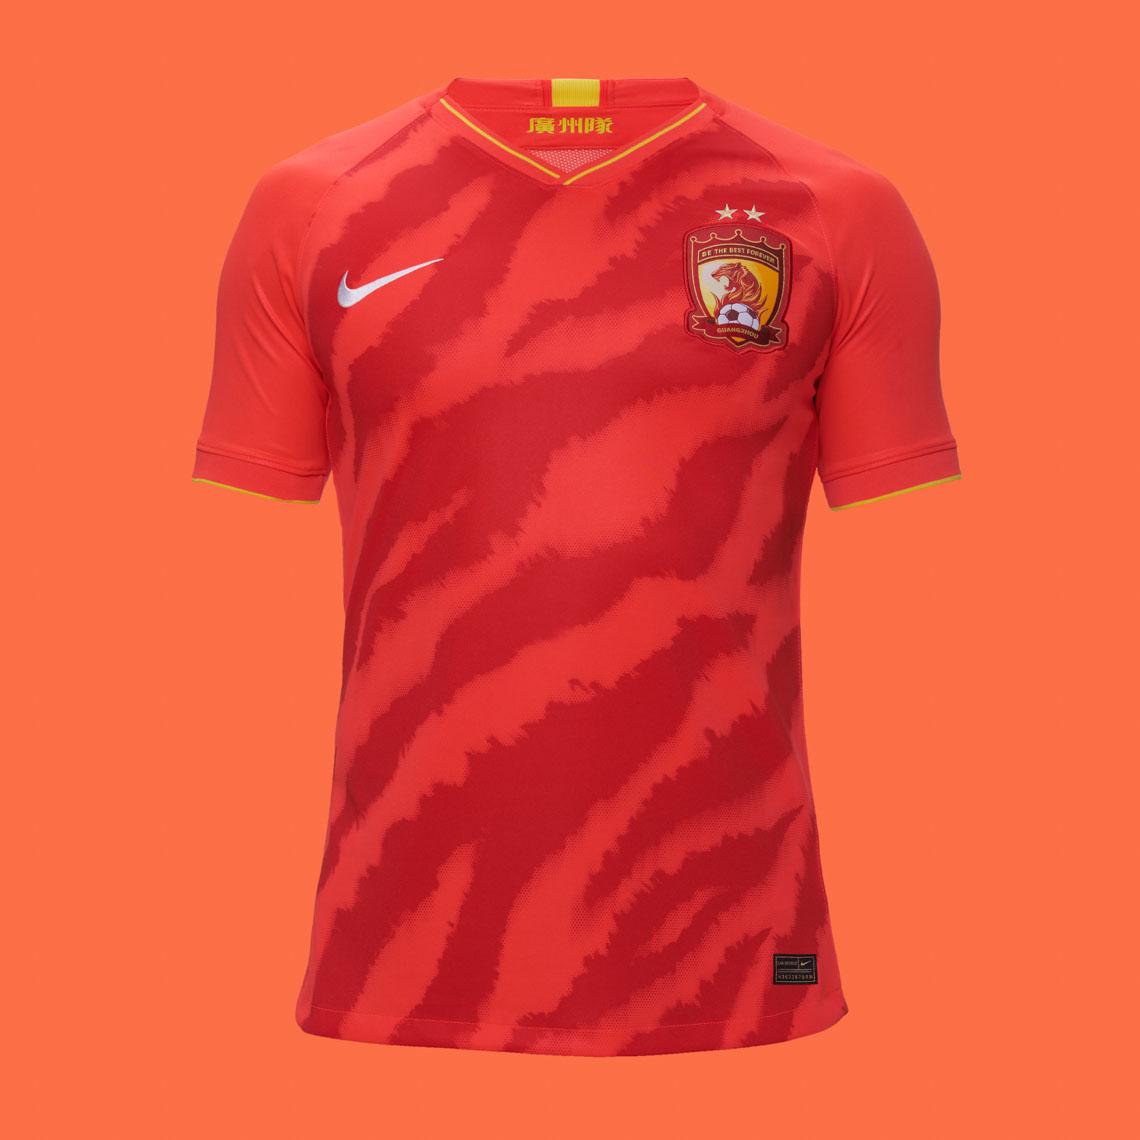 Guangzhou Evergrande 2020 Nike